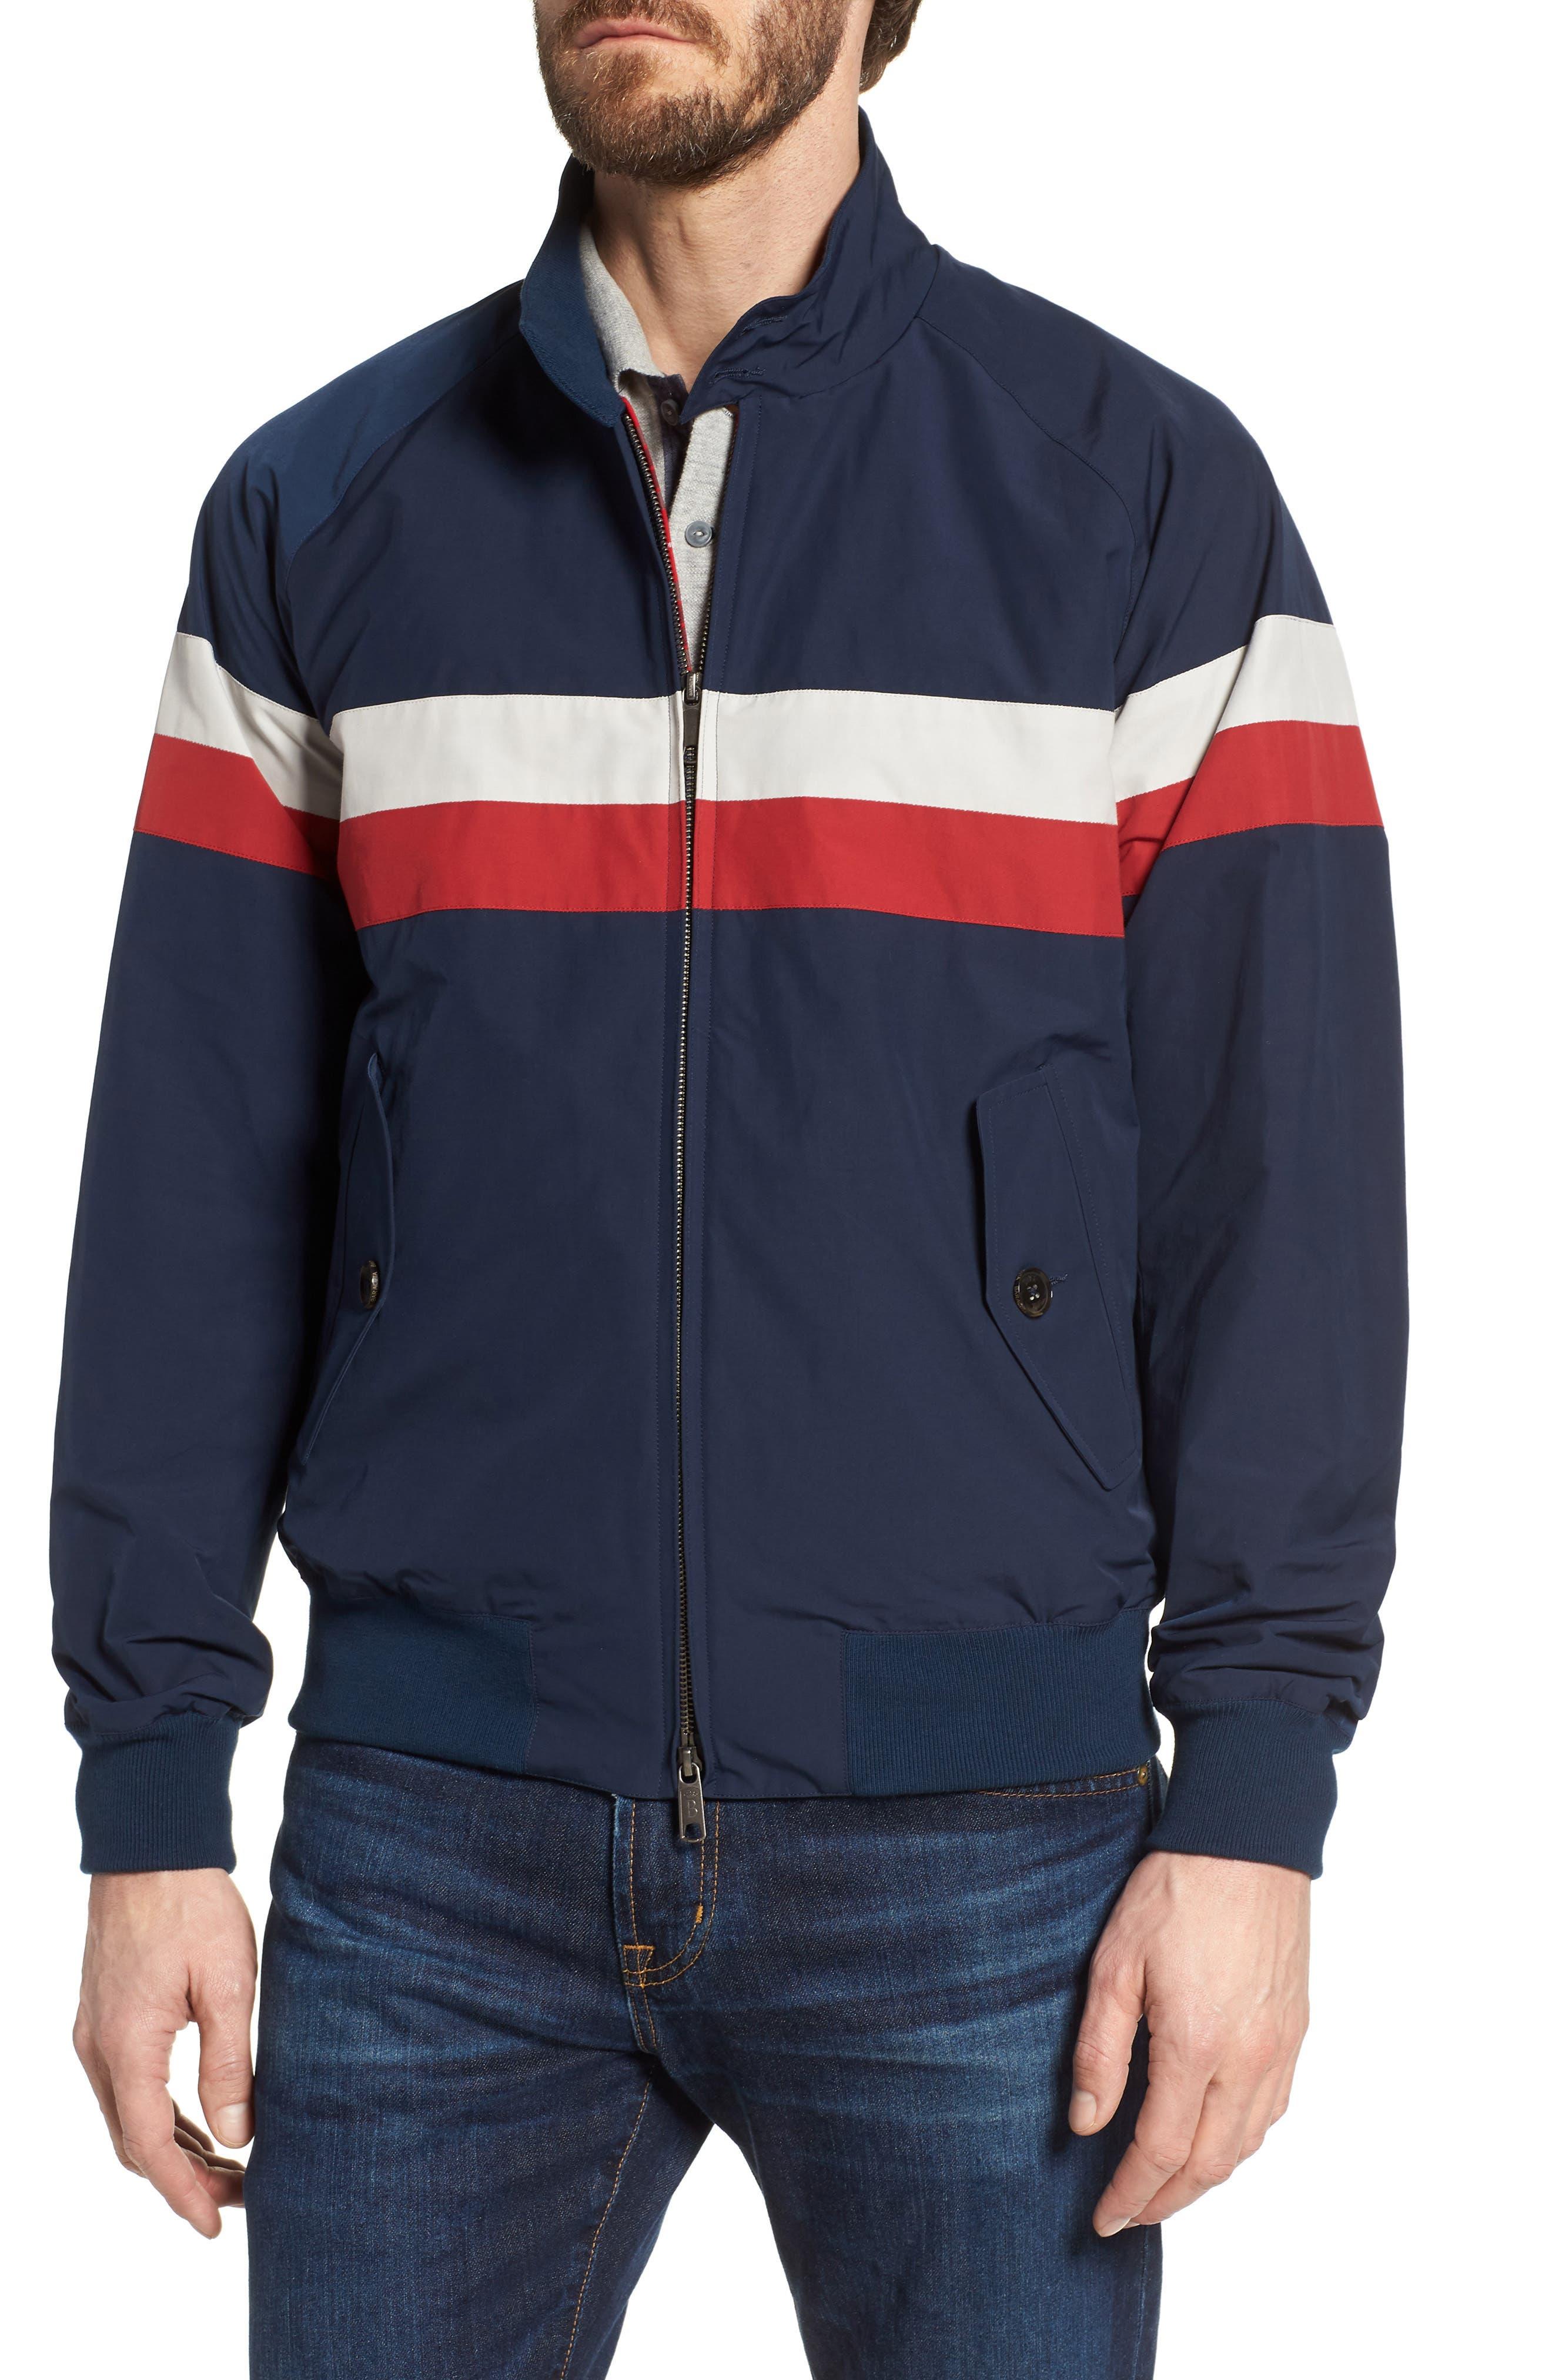 G9 Varsity Jacket,                             Alternate thumbnail 4, color,